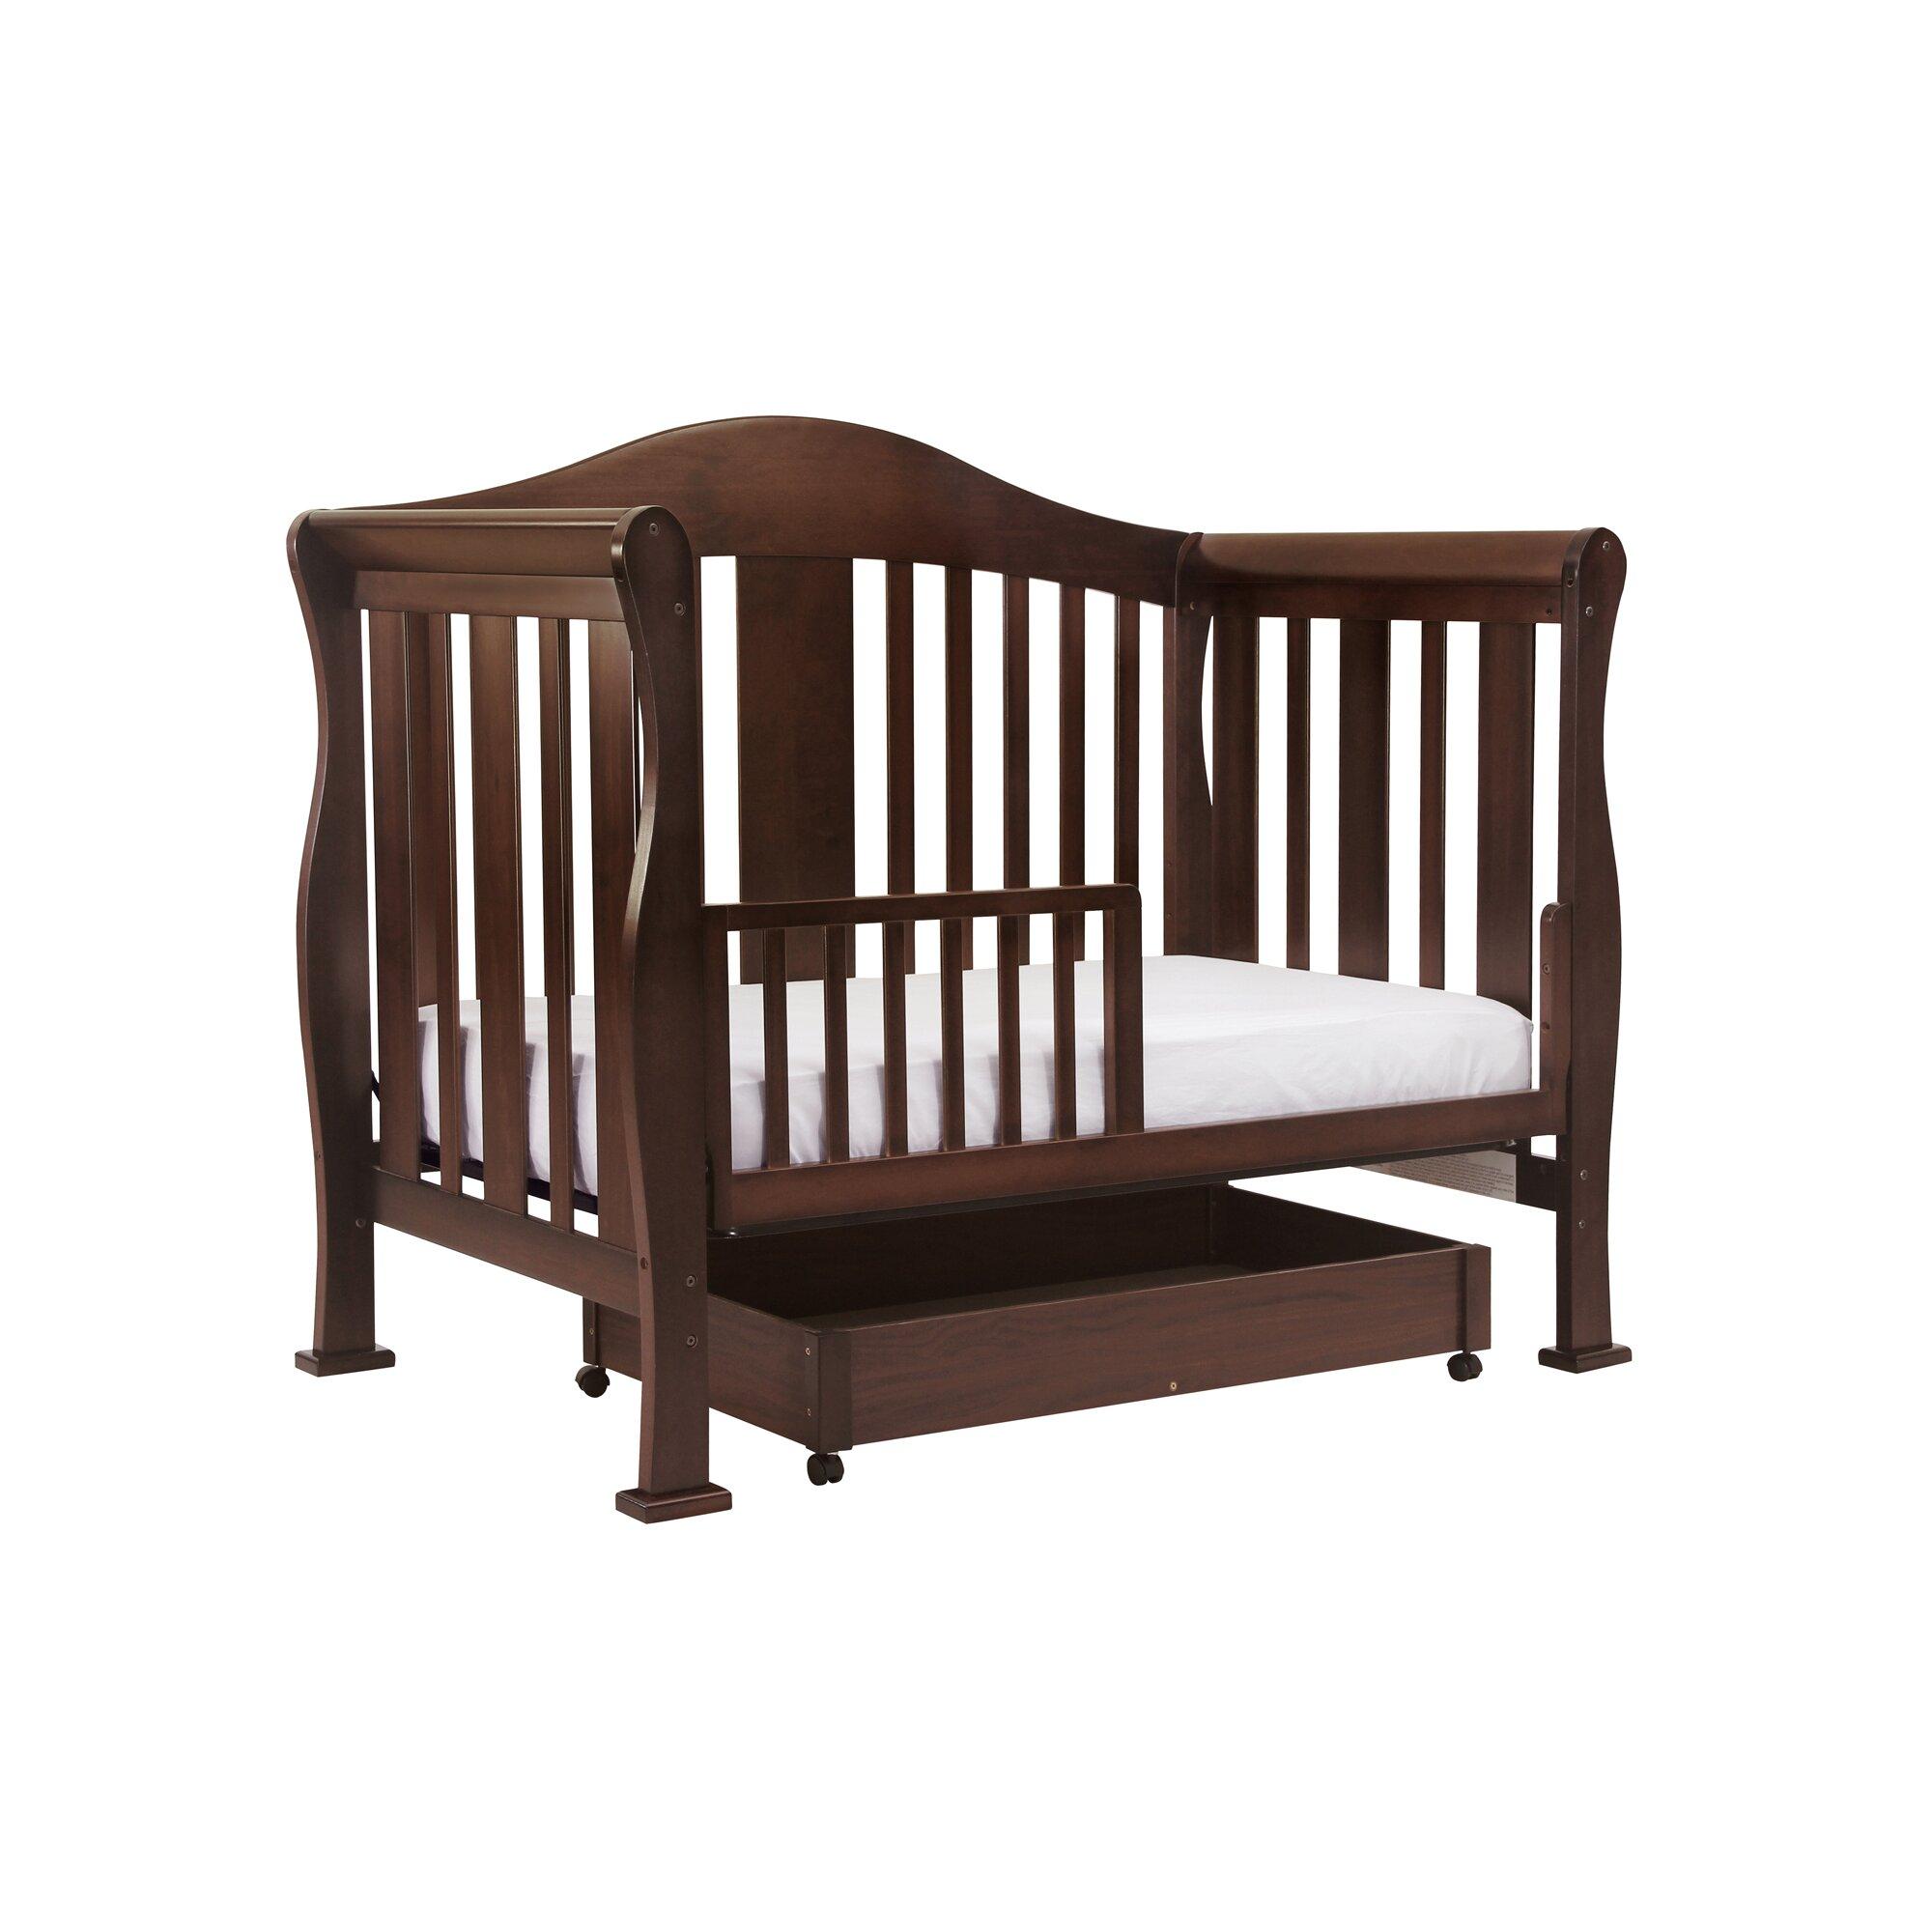 Davinci Parker 4 In 1 Convertible Crib Amp Reviews Wayfair